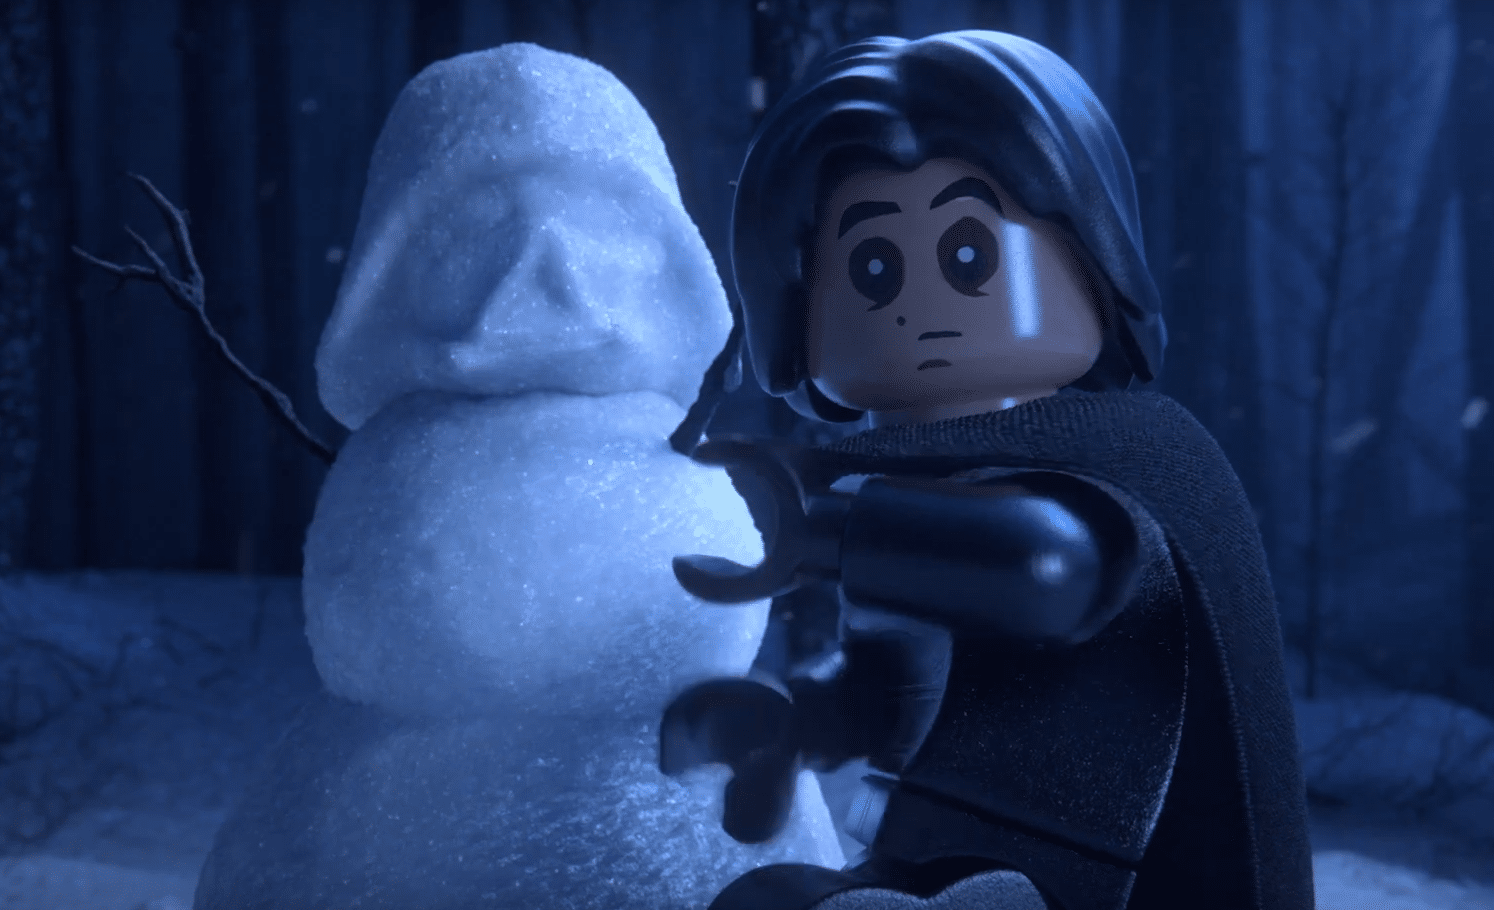 Lustige Szenen in LEGO Star Wars: The Skywalker Saga